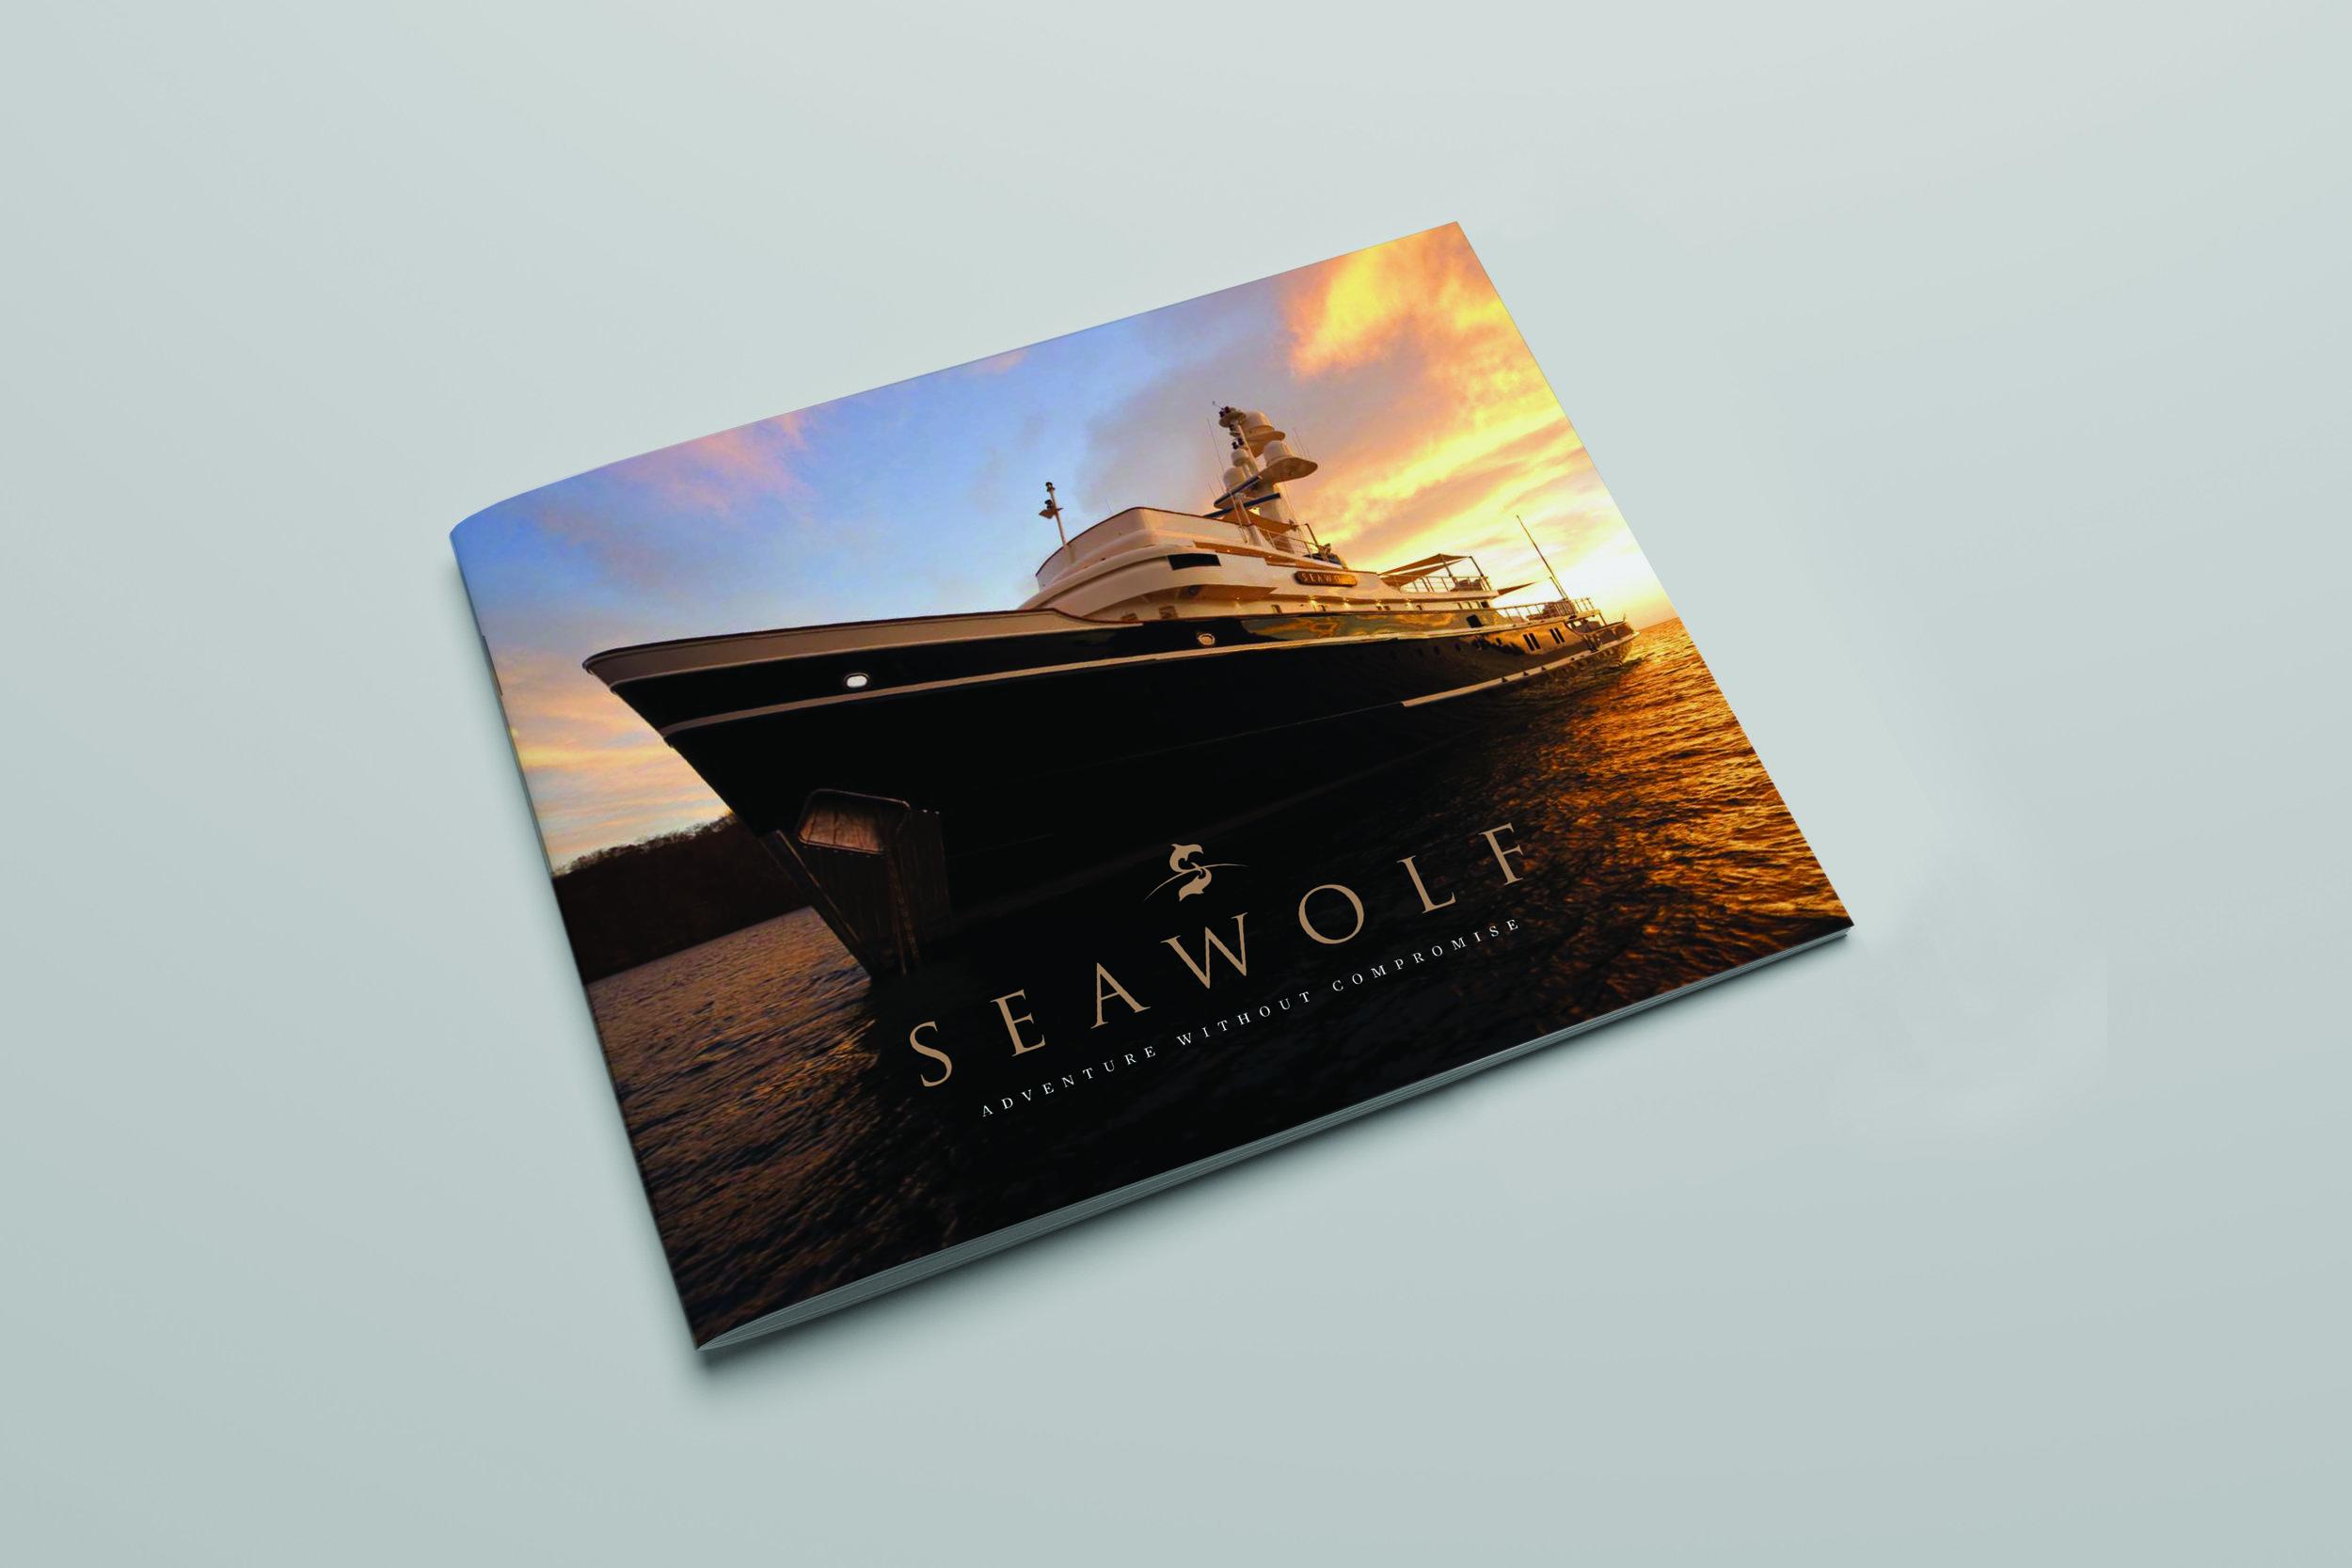 seawolf cover.jpg